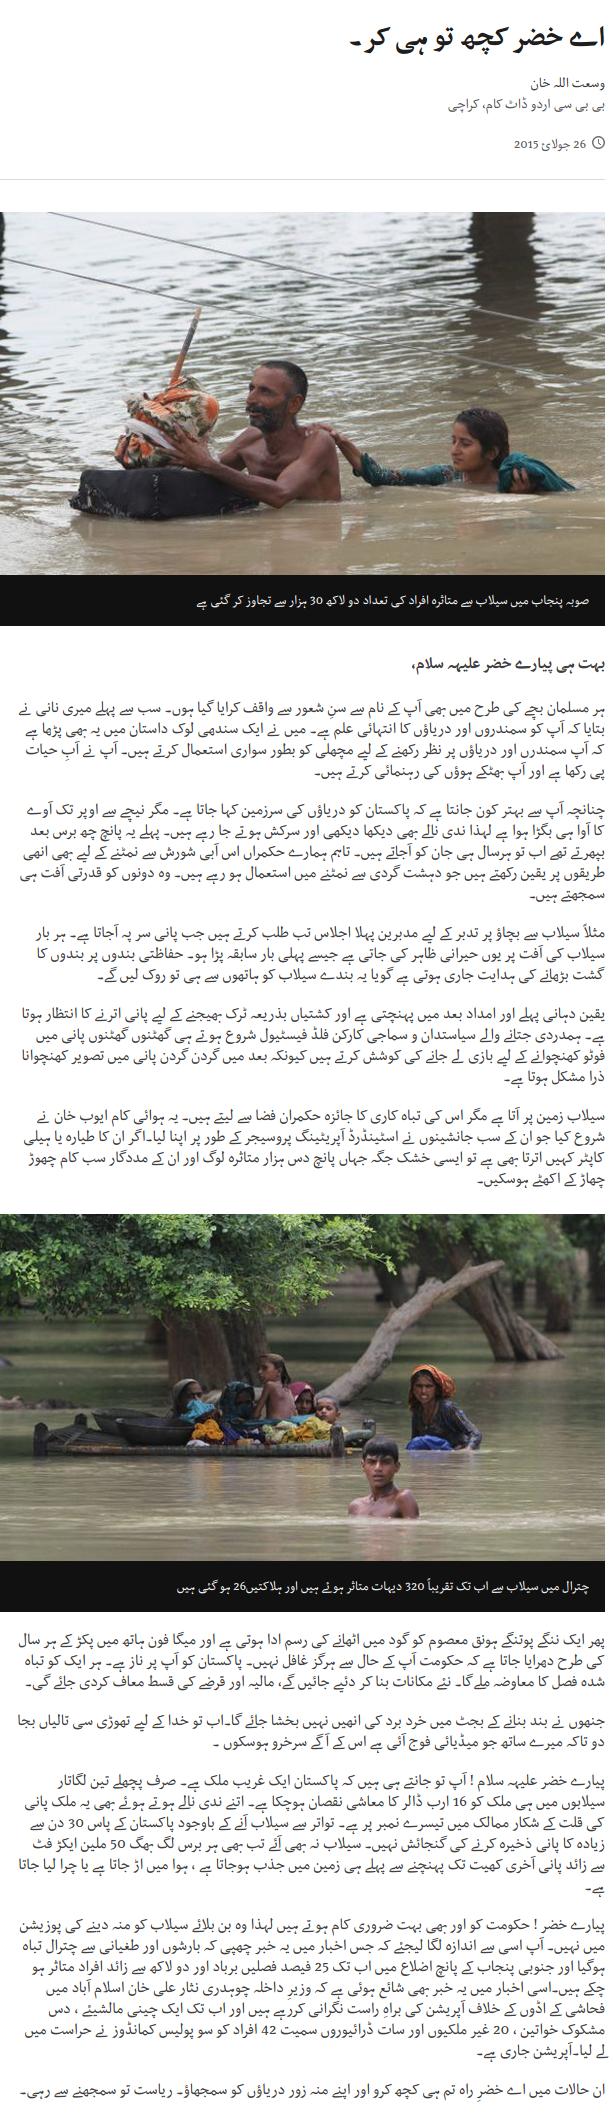 Wusatullah Khan Column | Aay Khizer Kuch Tu He Kr | Baat Say Baat